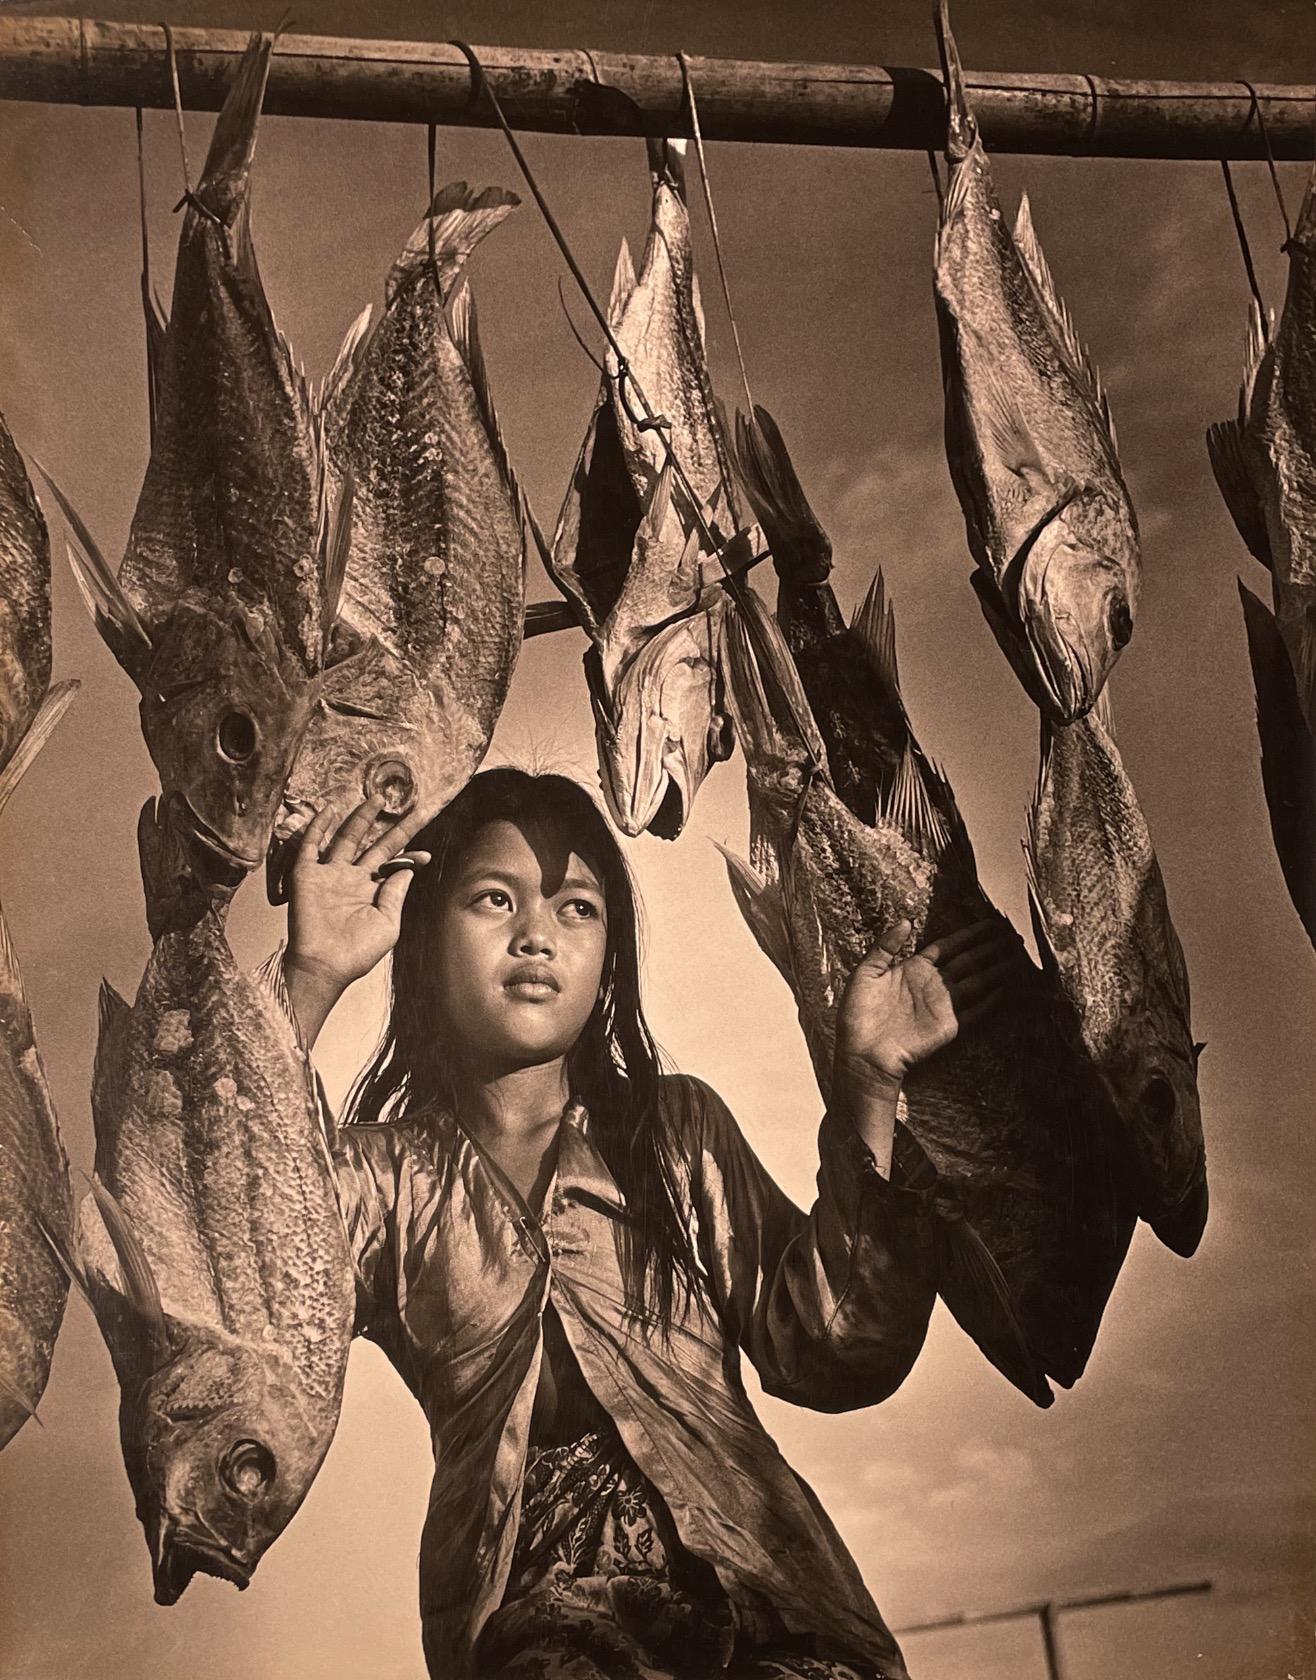 Yip Cheong Fun, Fisherman's Daughter, silver gelatin print